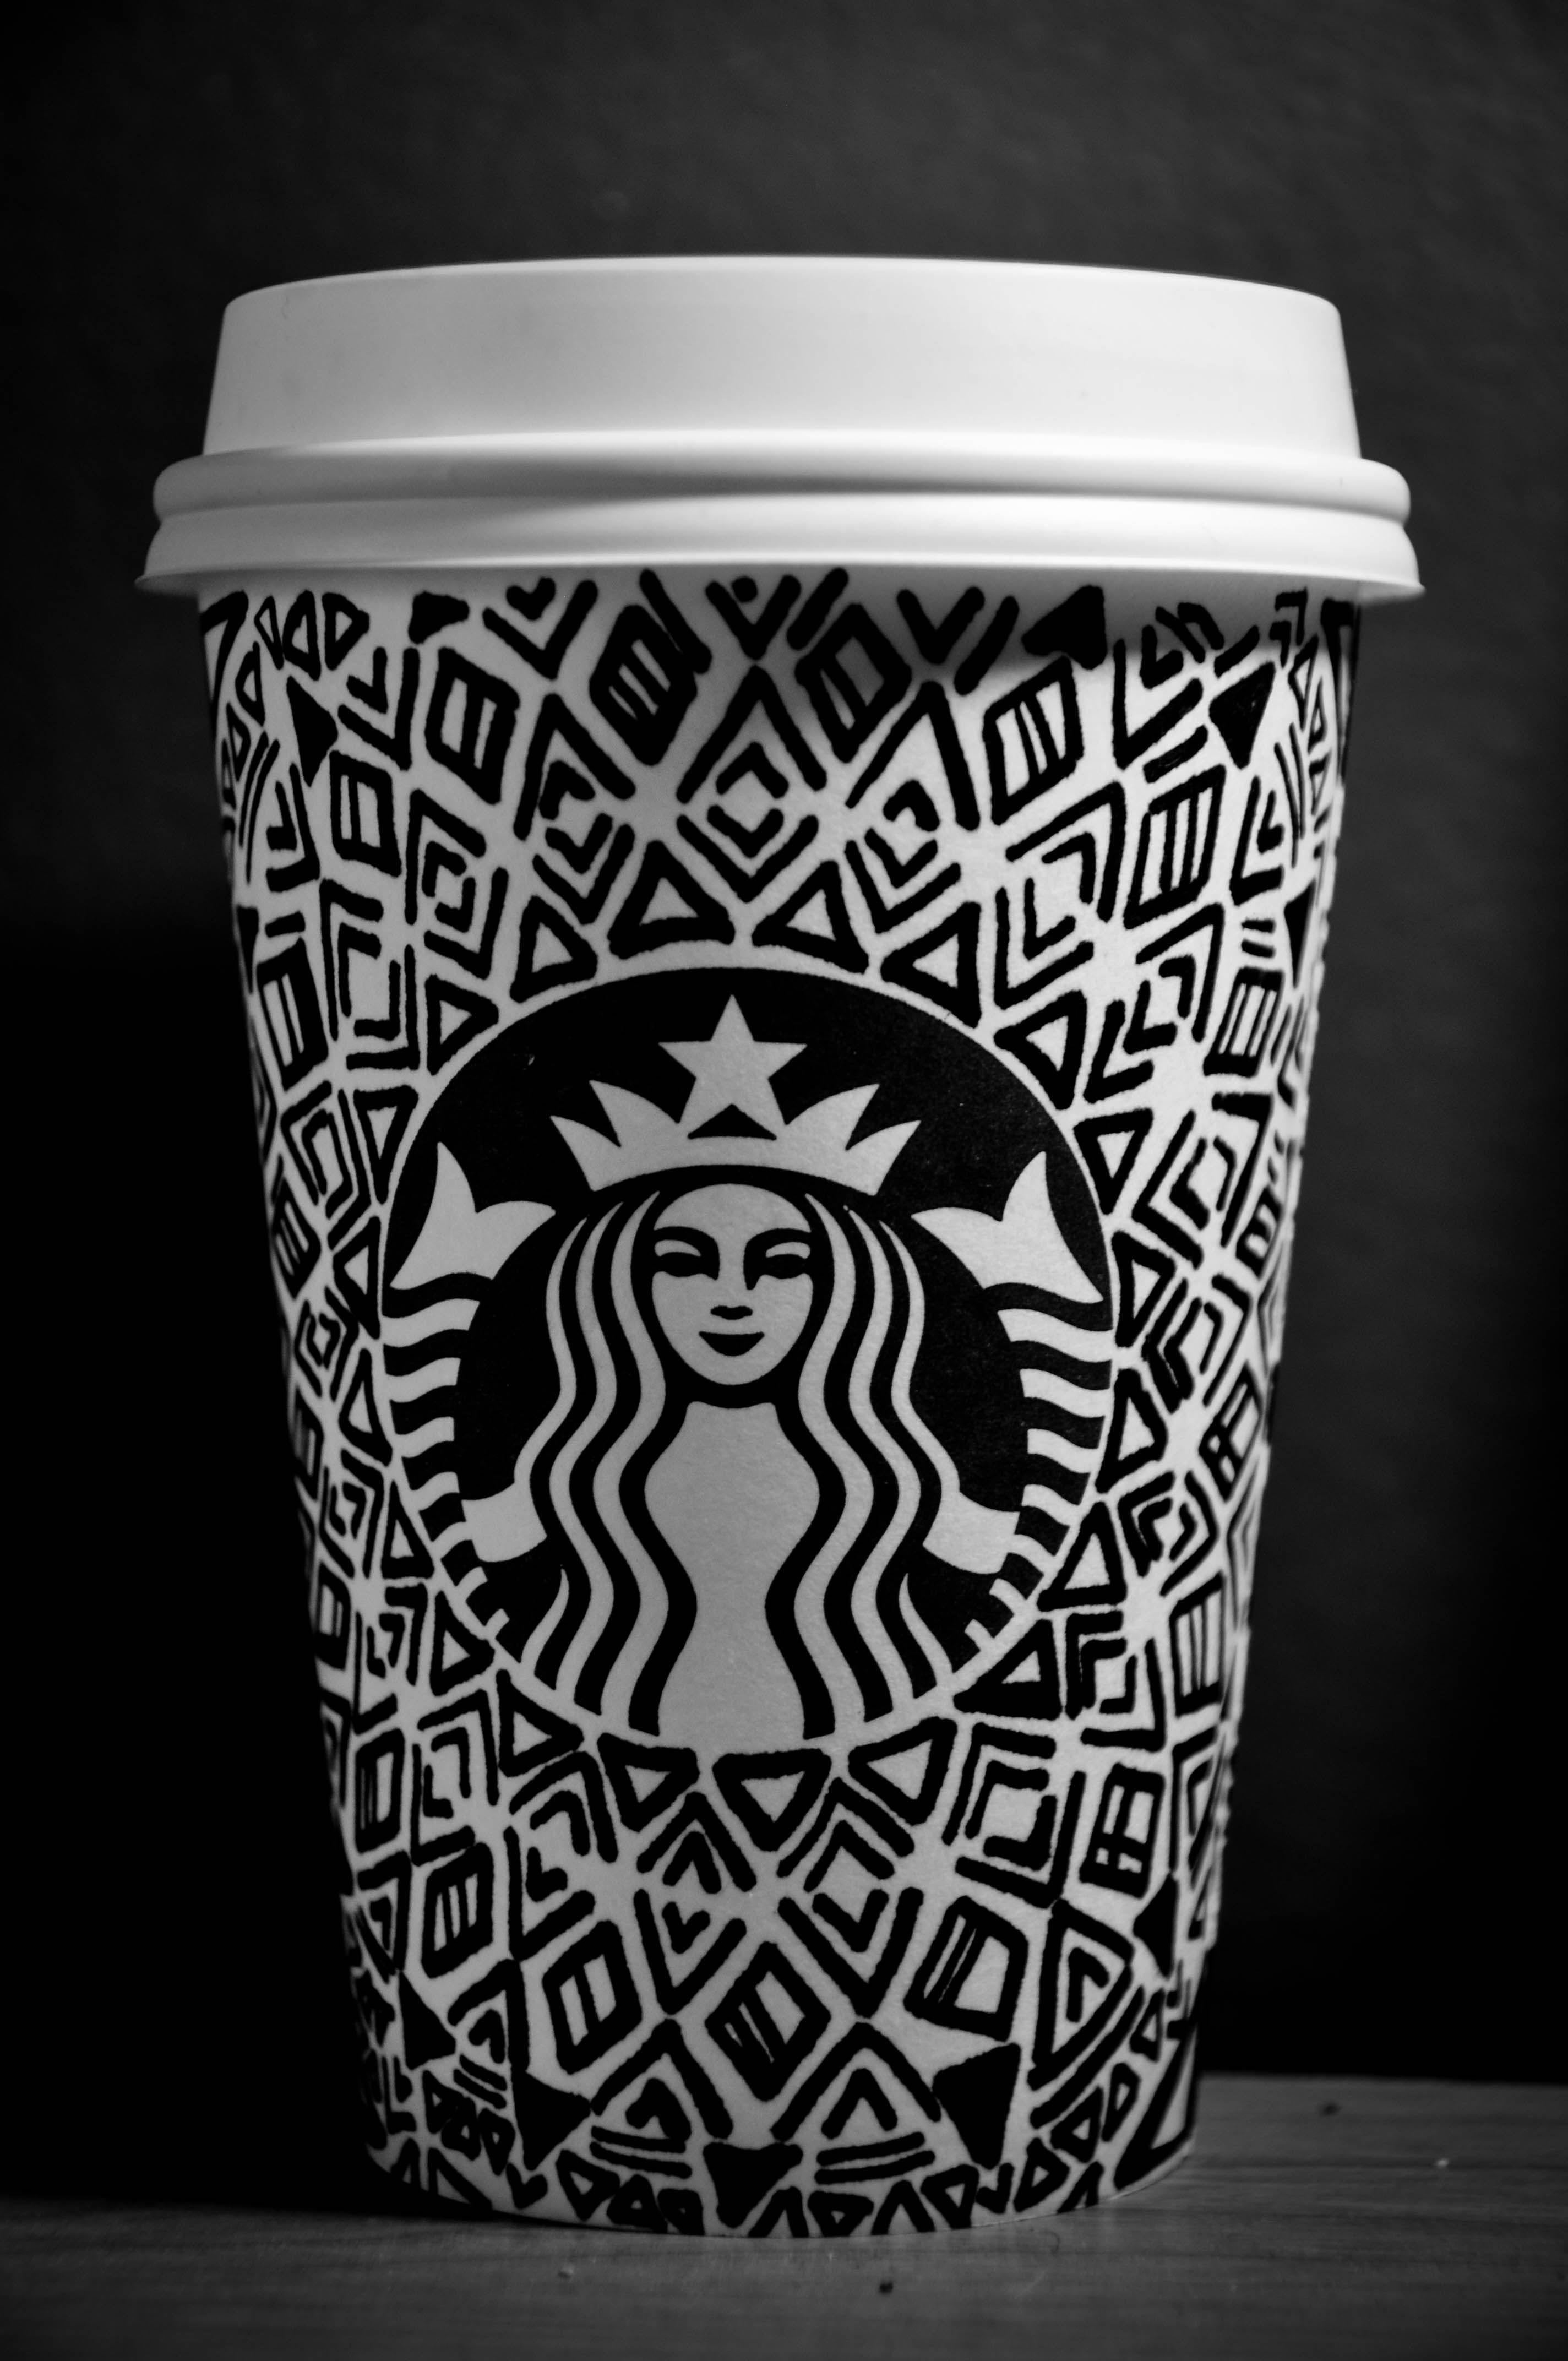 best images about starbucks art cat women 17 best images about starbucks art cat women coffee and starbucks cup art